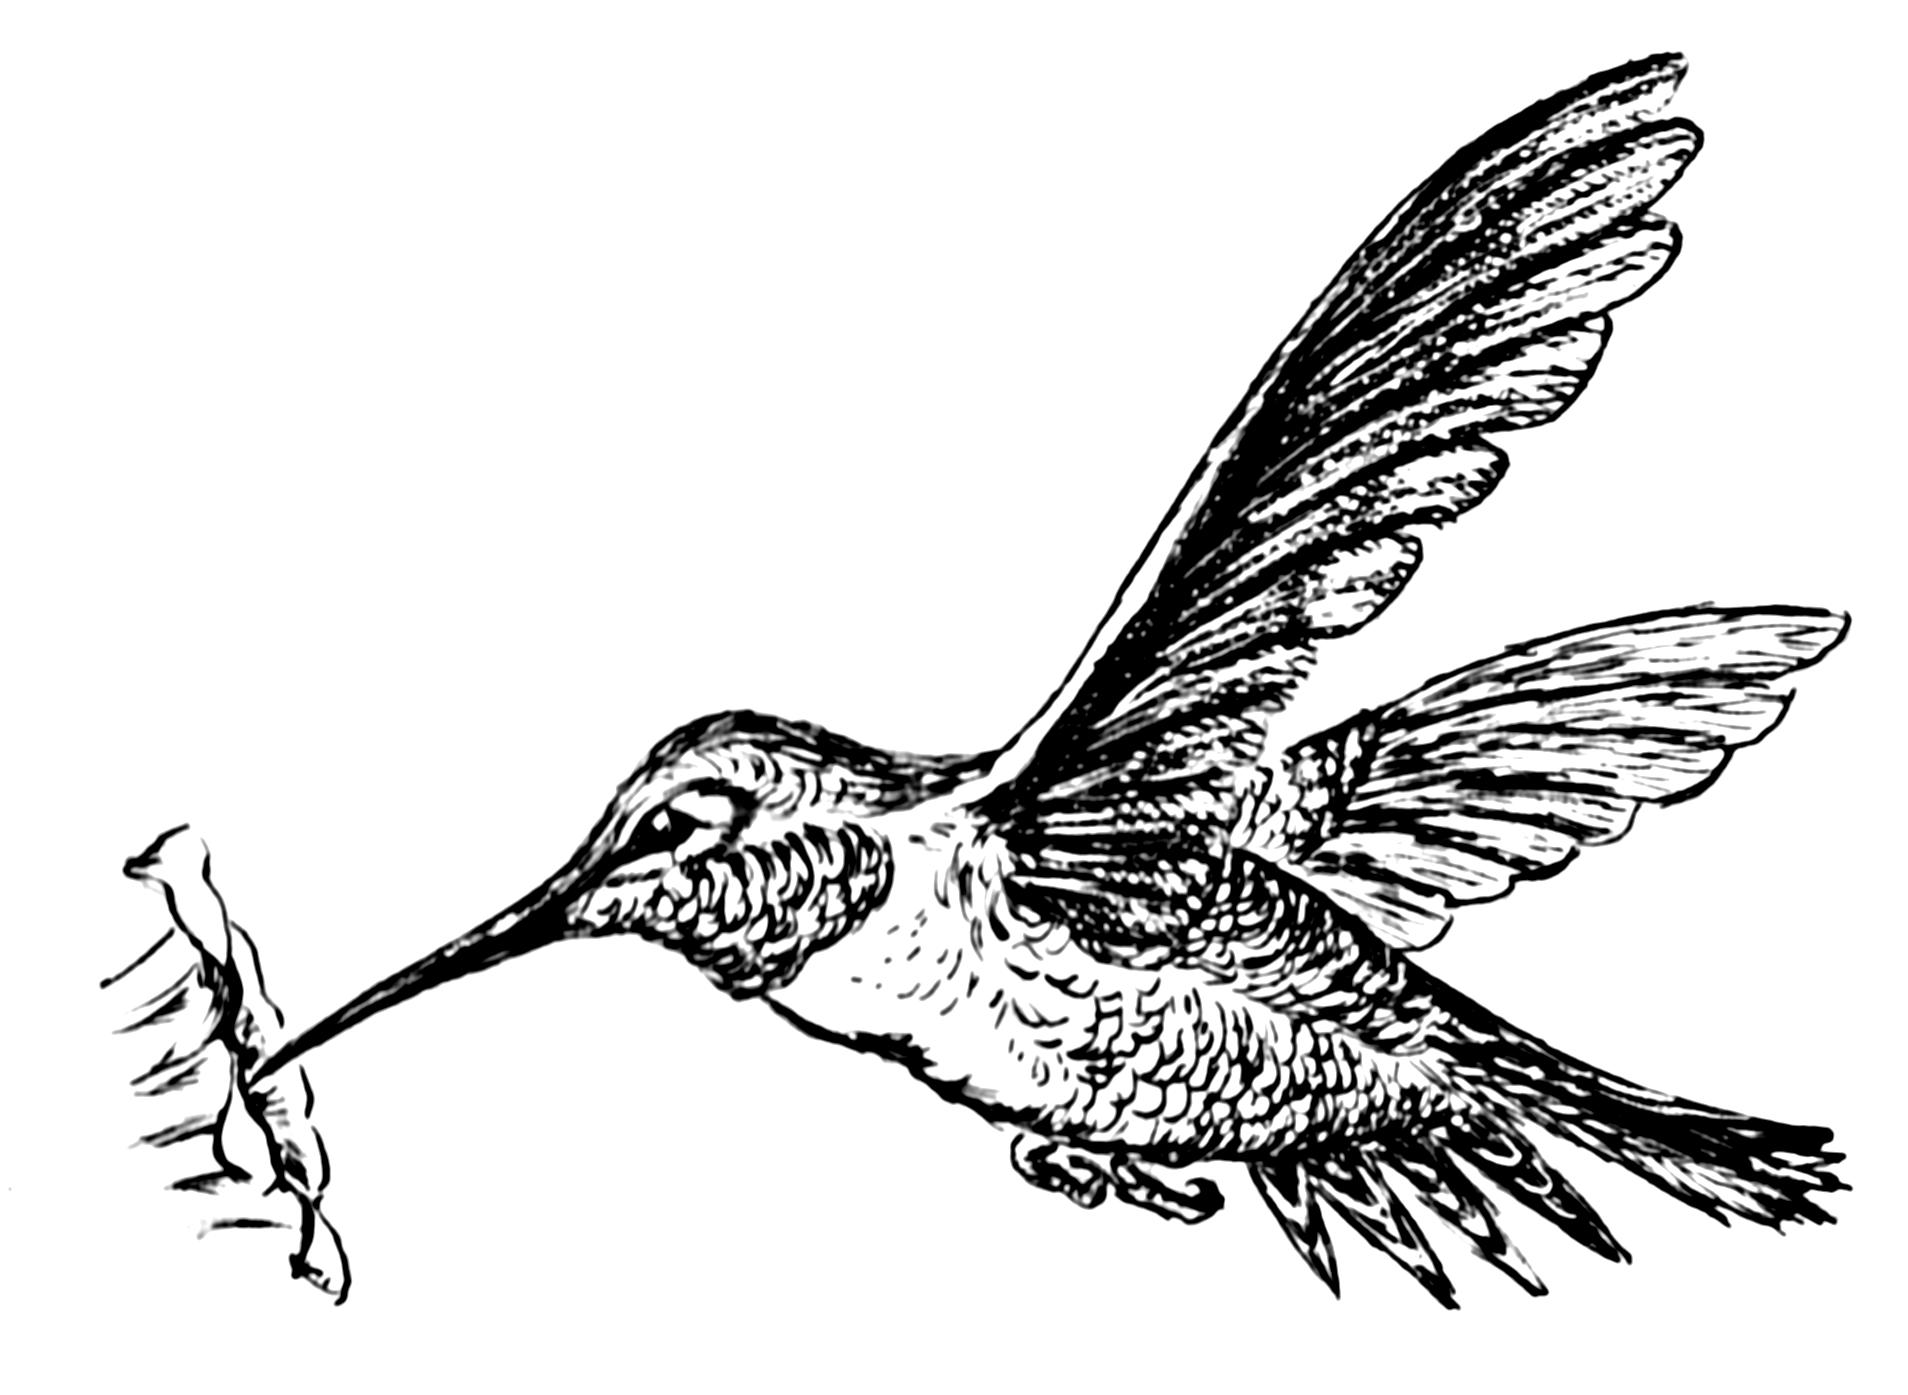 Line Drawing Hummingbird : Hummingbird drawings clipart best